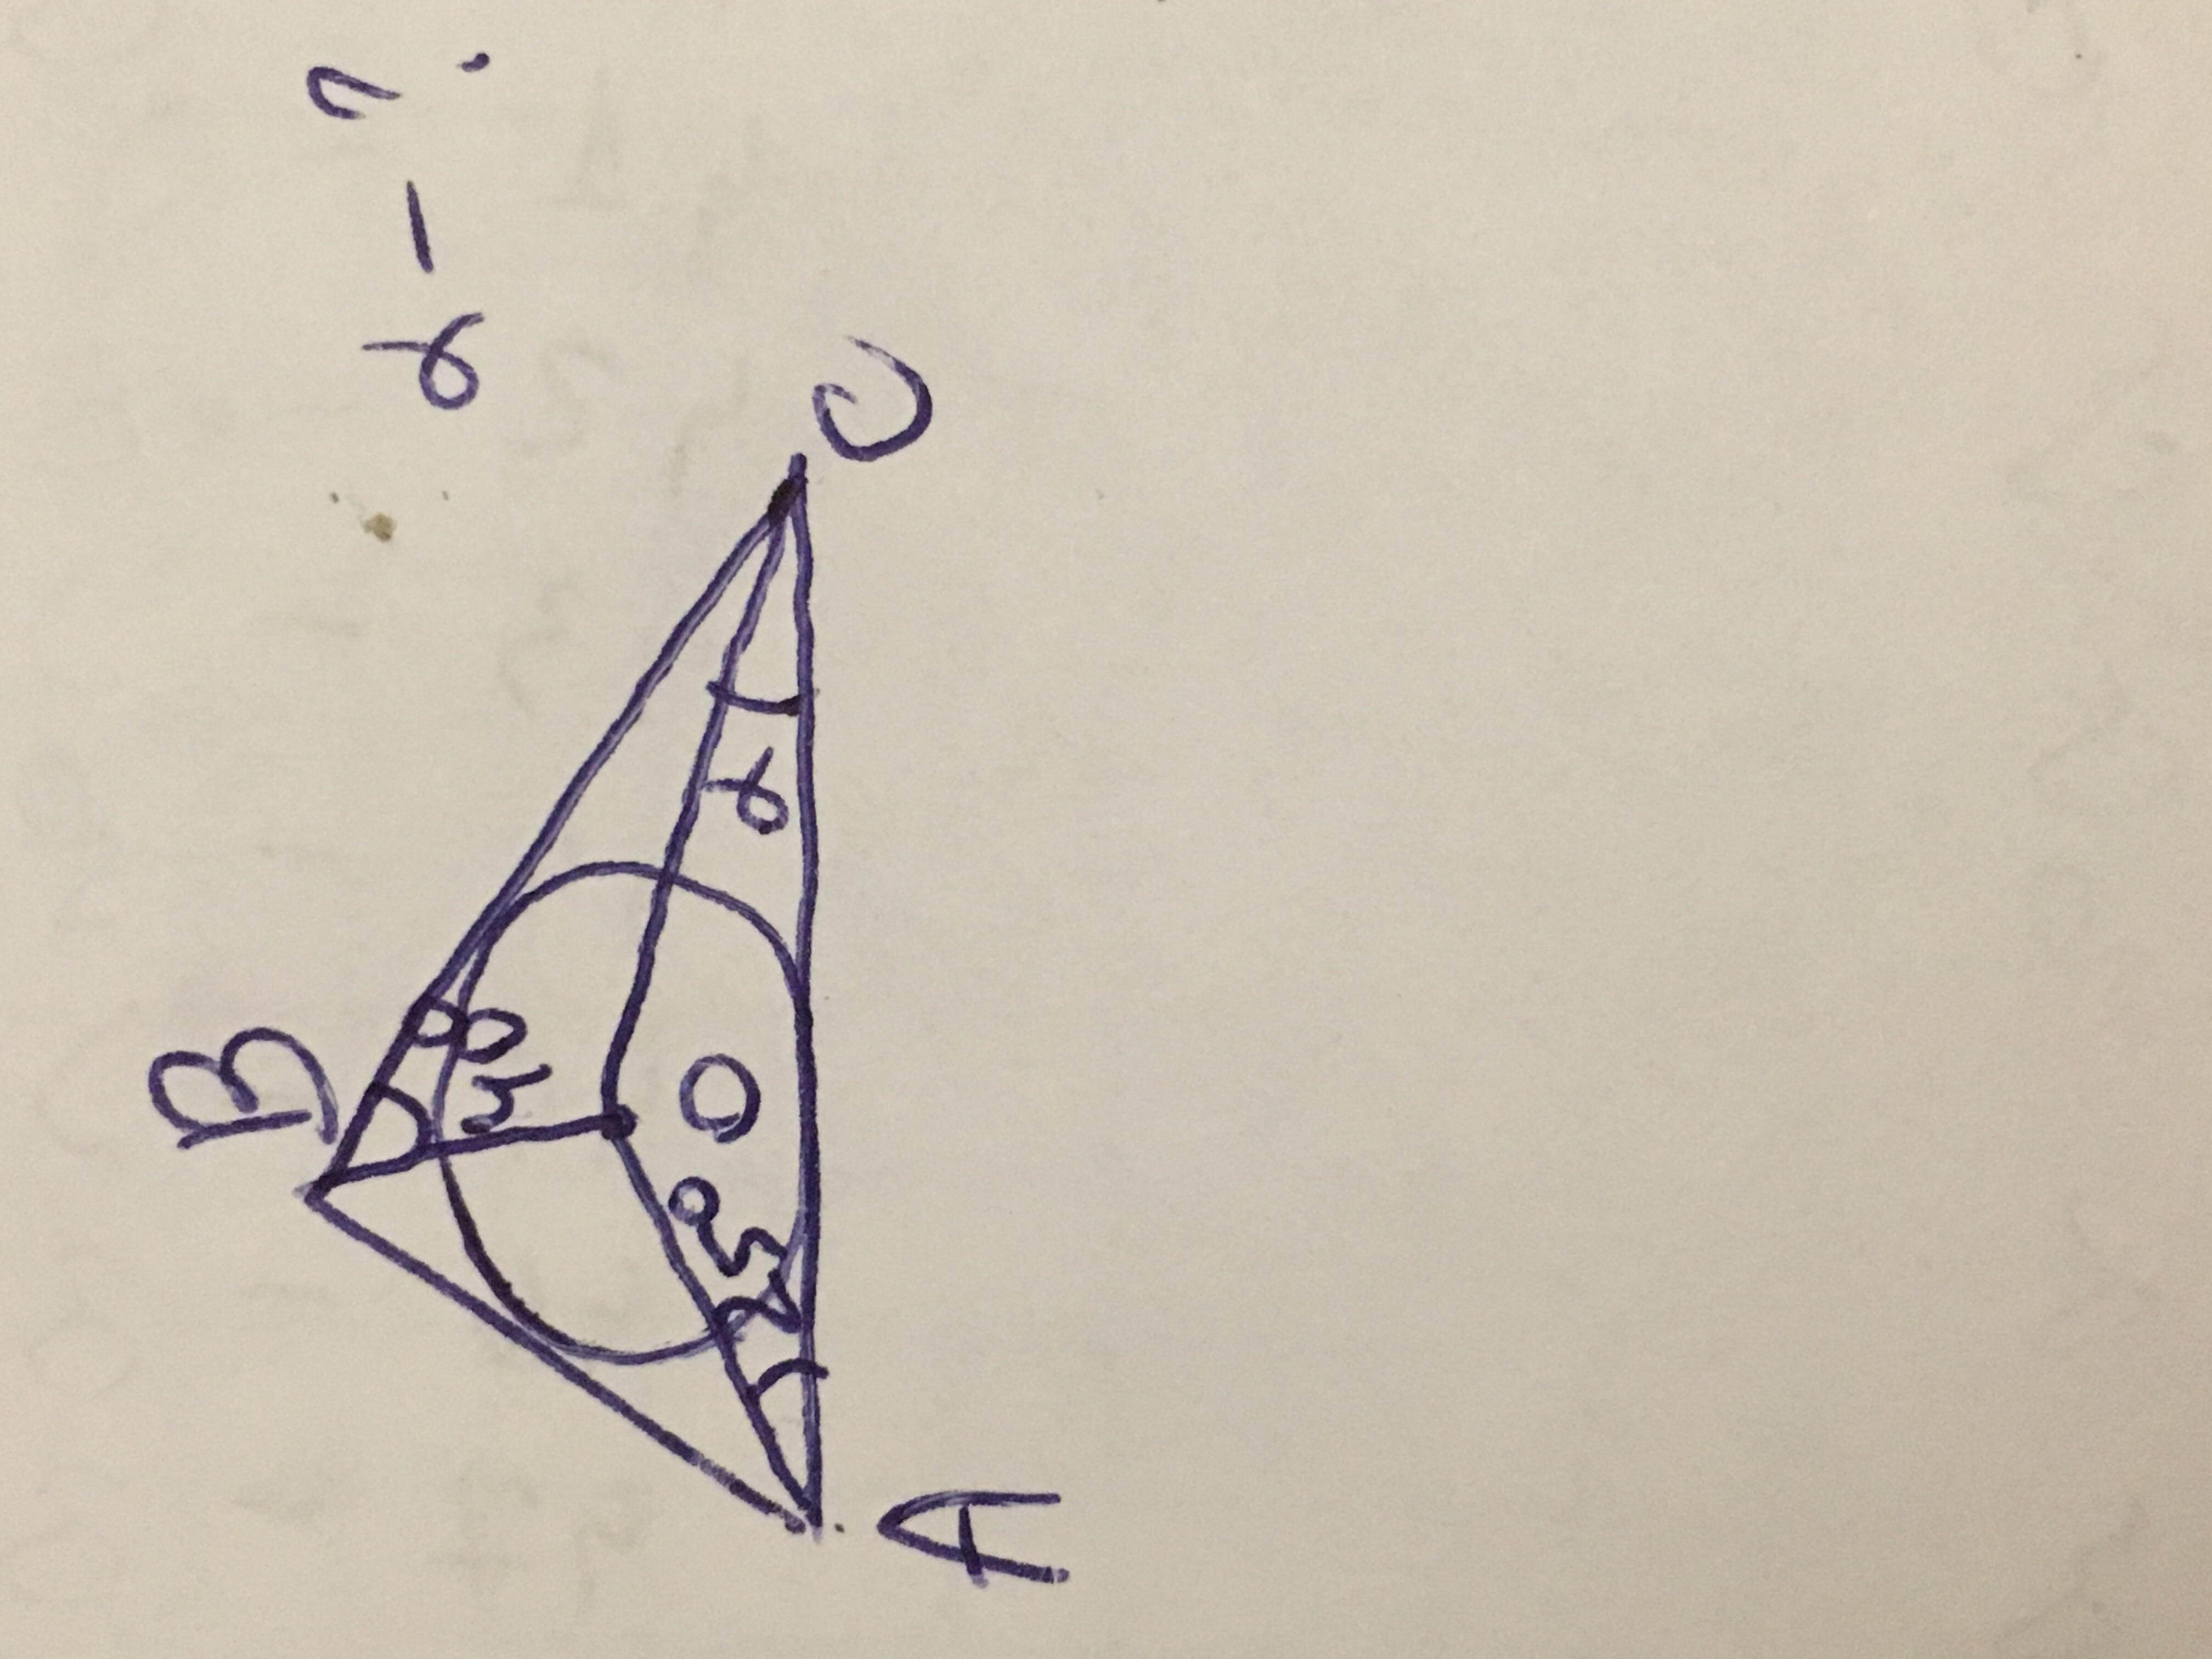 Найдите угол АСО если угол САО=25° а угол СВО=40°